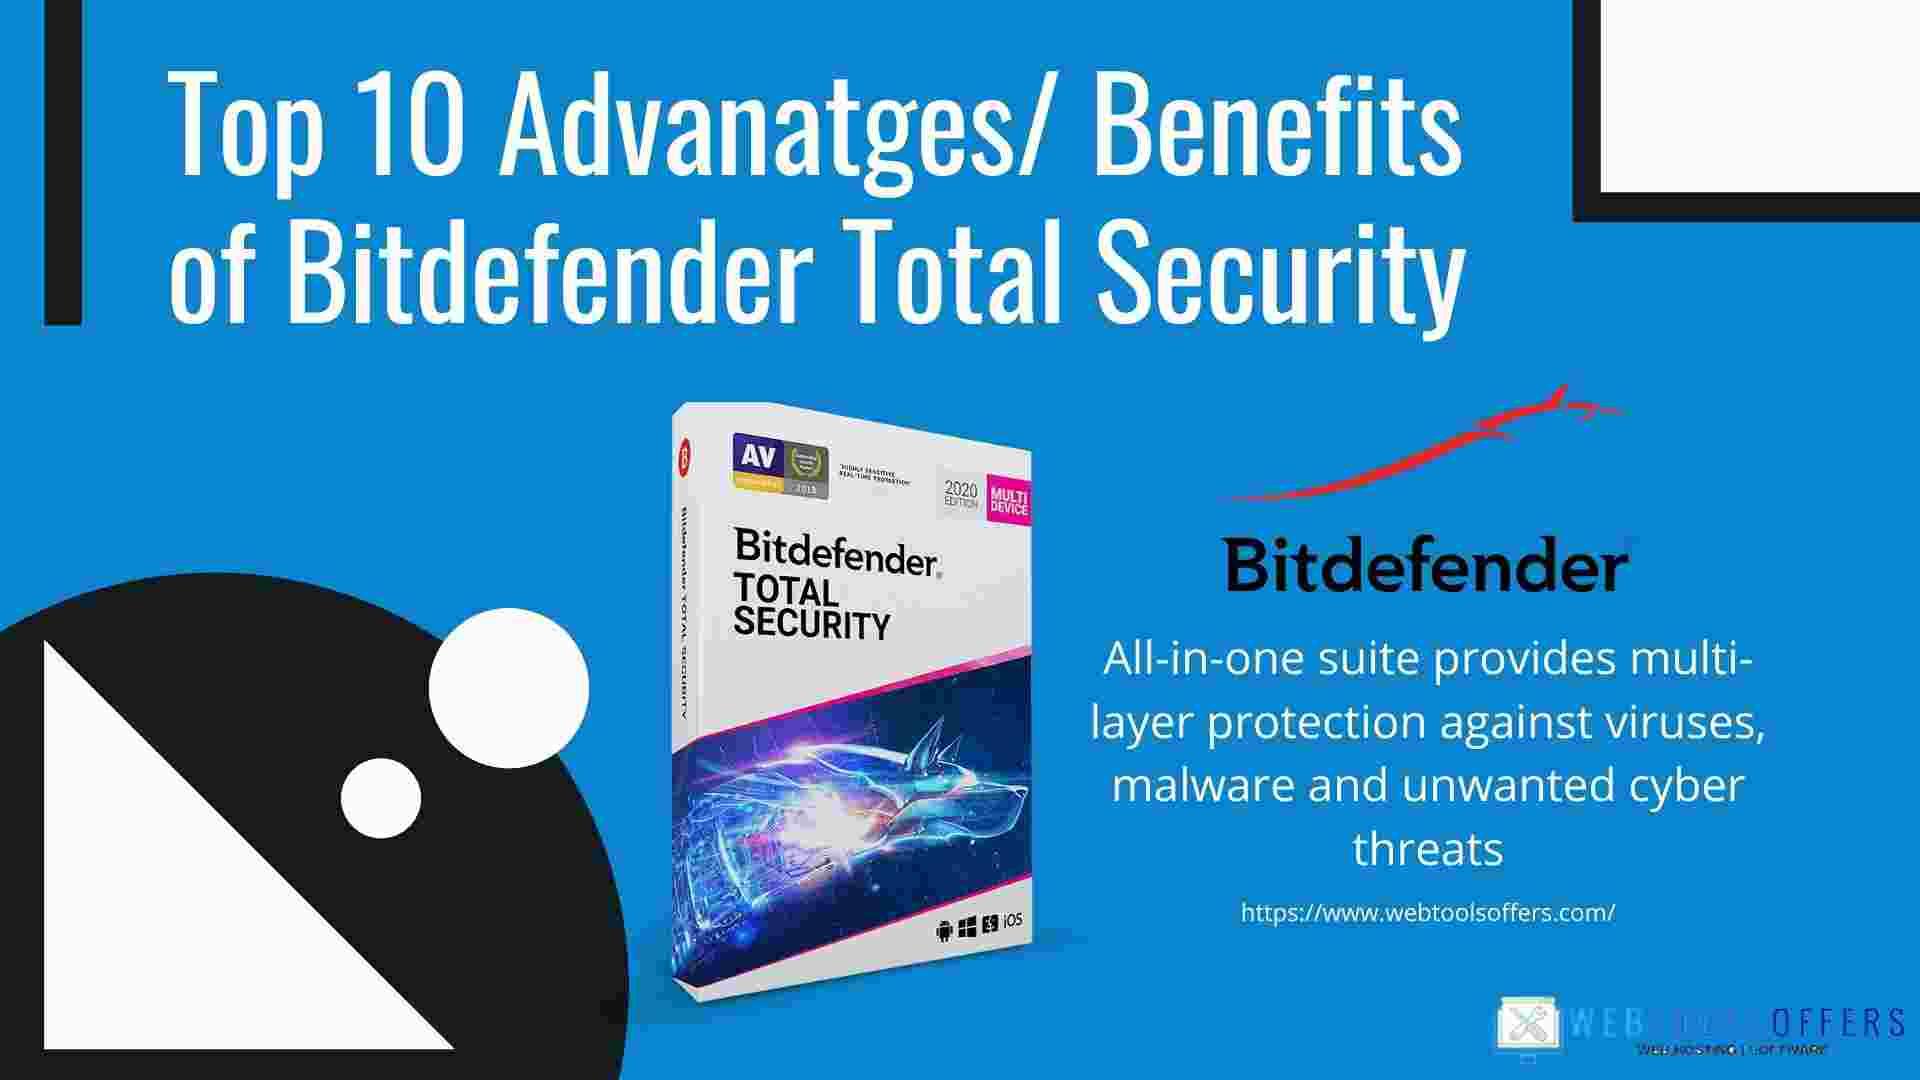 Benefits of Bitdefender Total Security